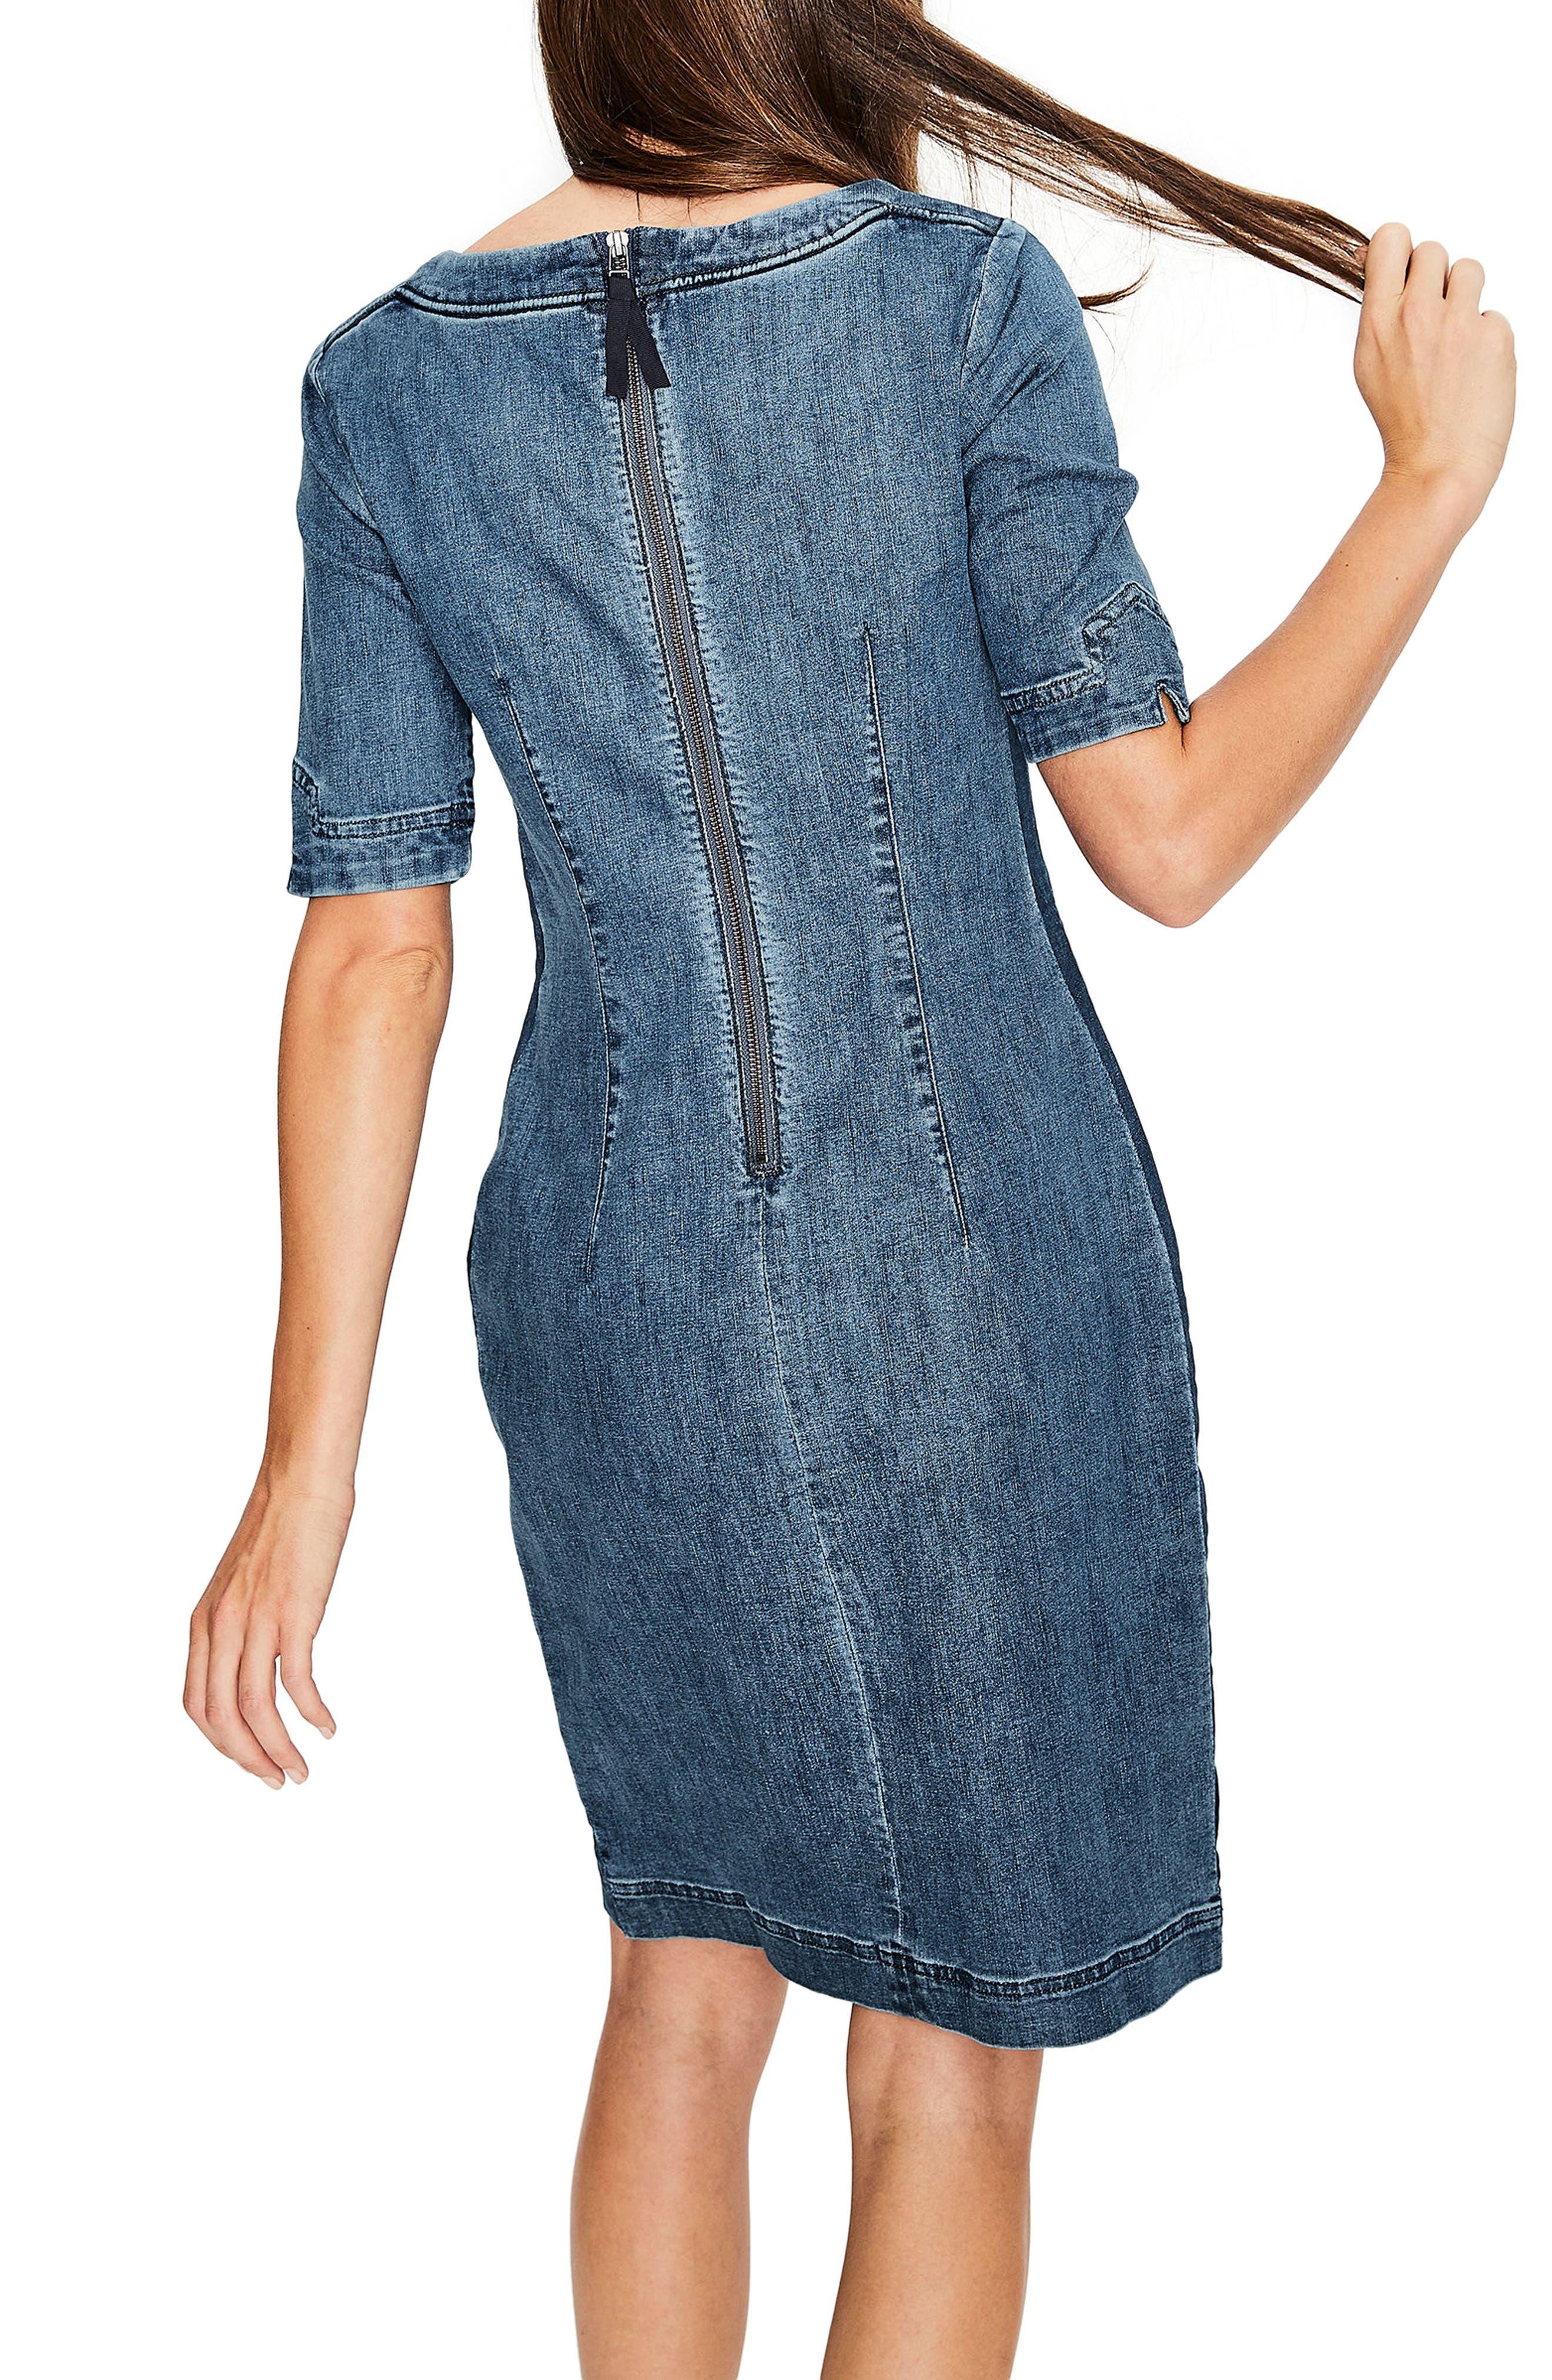 Rhea Denim Contrast Dress,                             Alternate thumbnail 2, color,                             MID VINTAGE WITH SIDE STRIPE